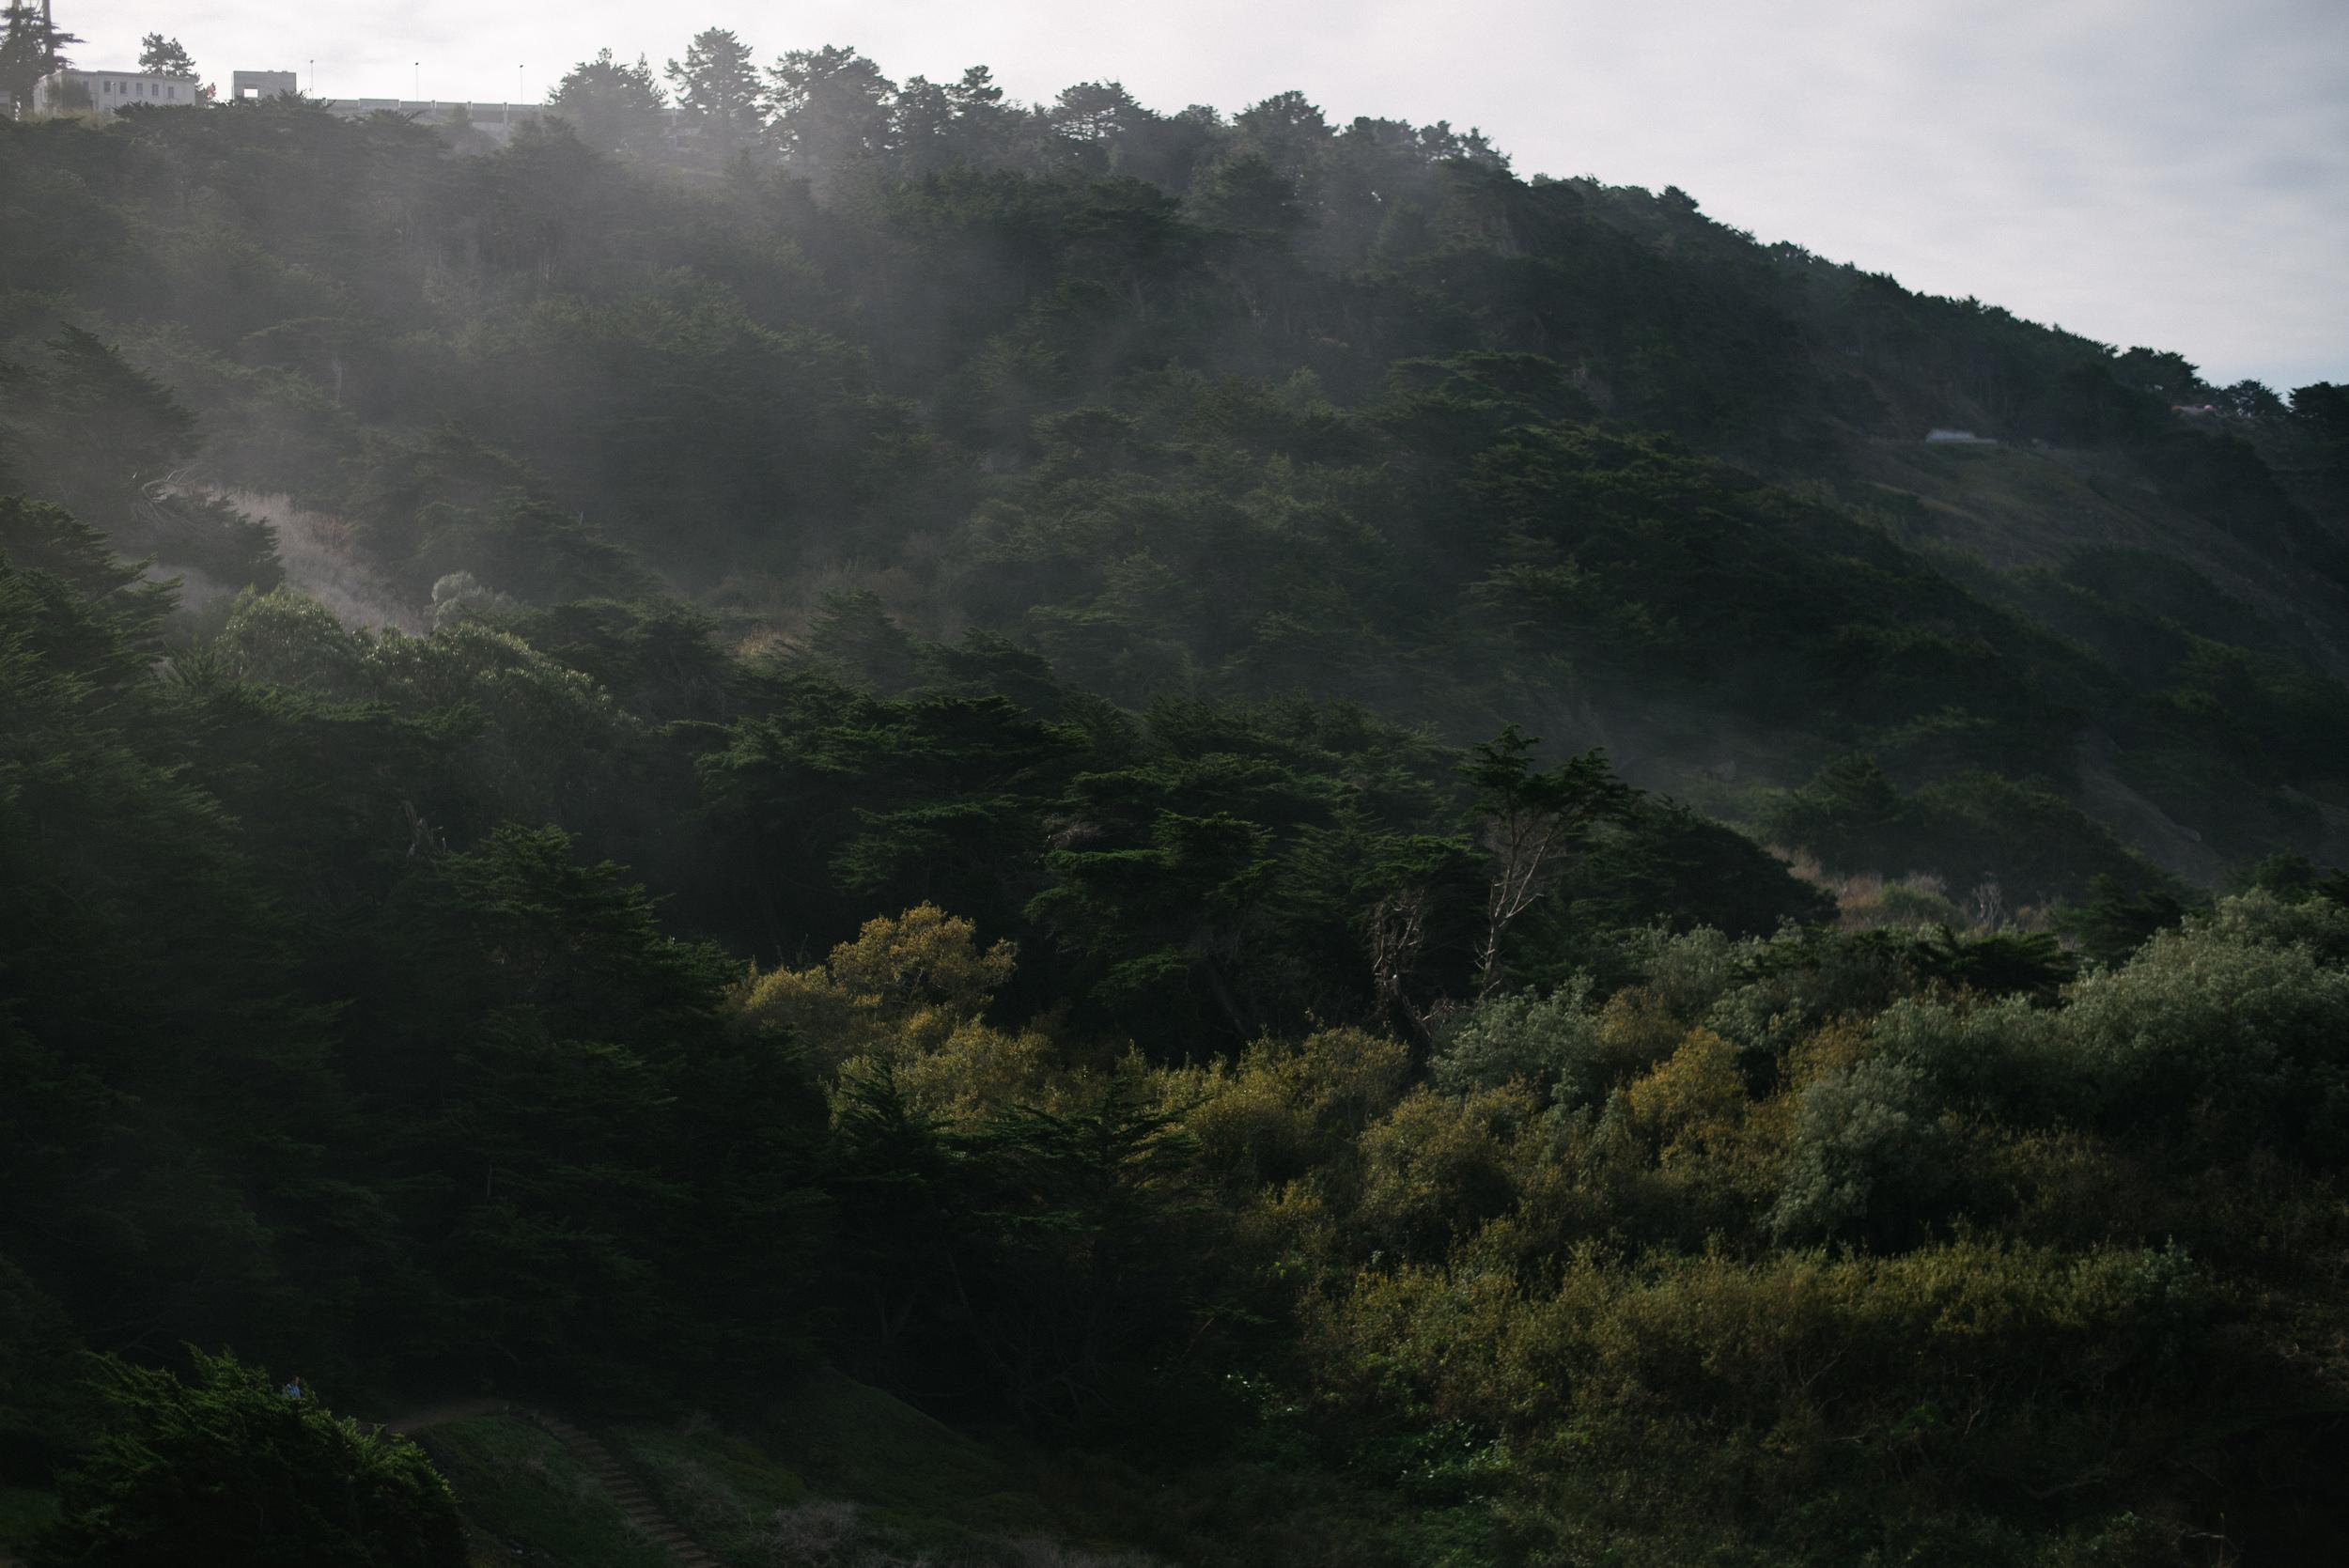 California-travel-outdoors-fog-trees-nature